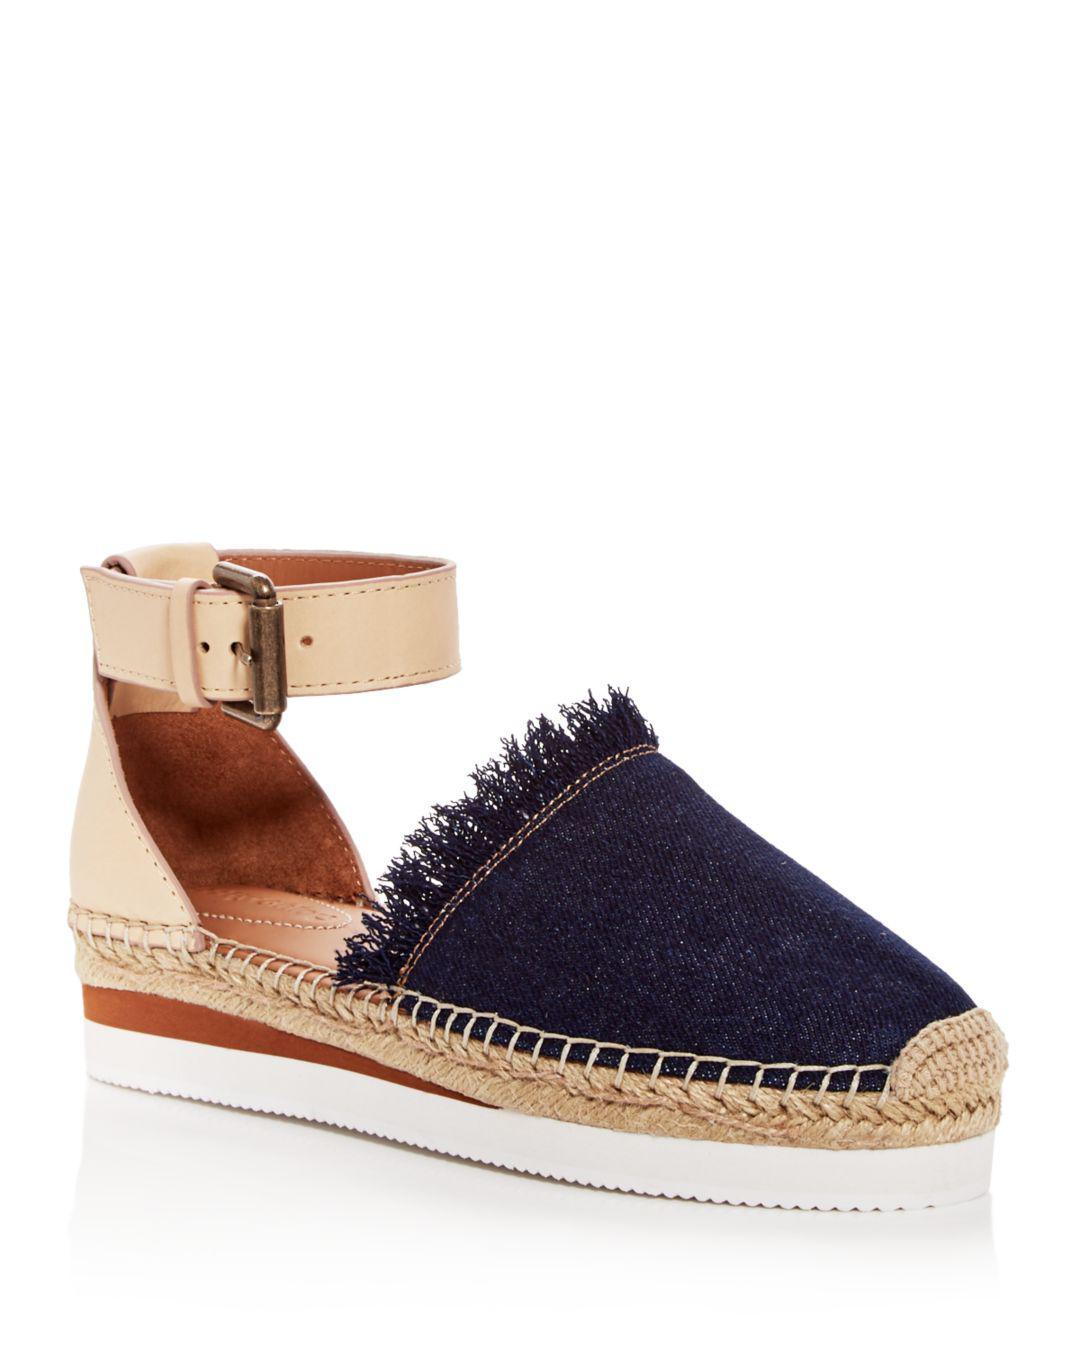 856ffbafa See By Chloé Women's Leather & Denim Fringe Platform Sandals in Blue ...